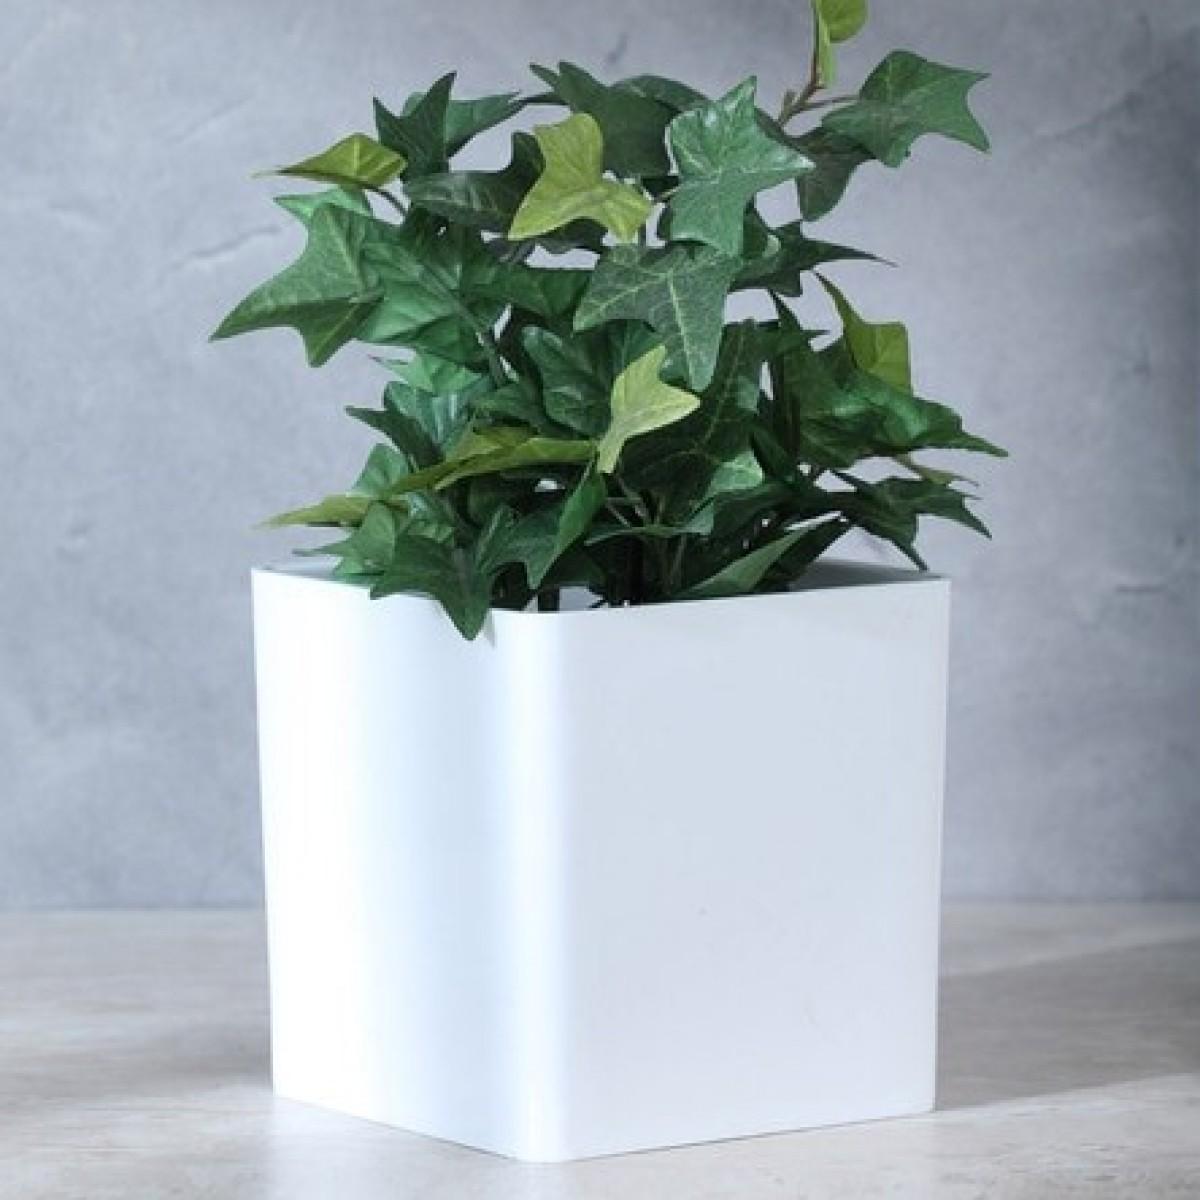 Cube White 10x10x10cm Acrylic Vase - 1 No